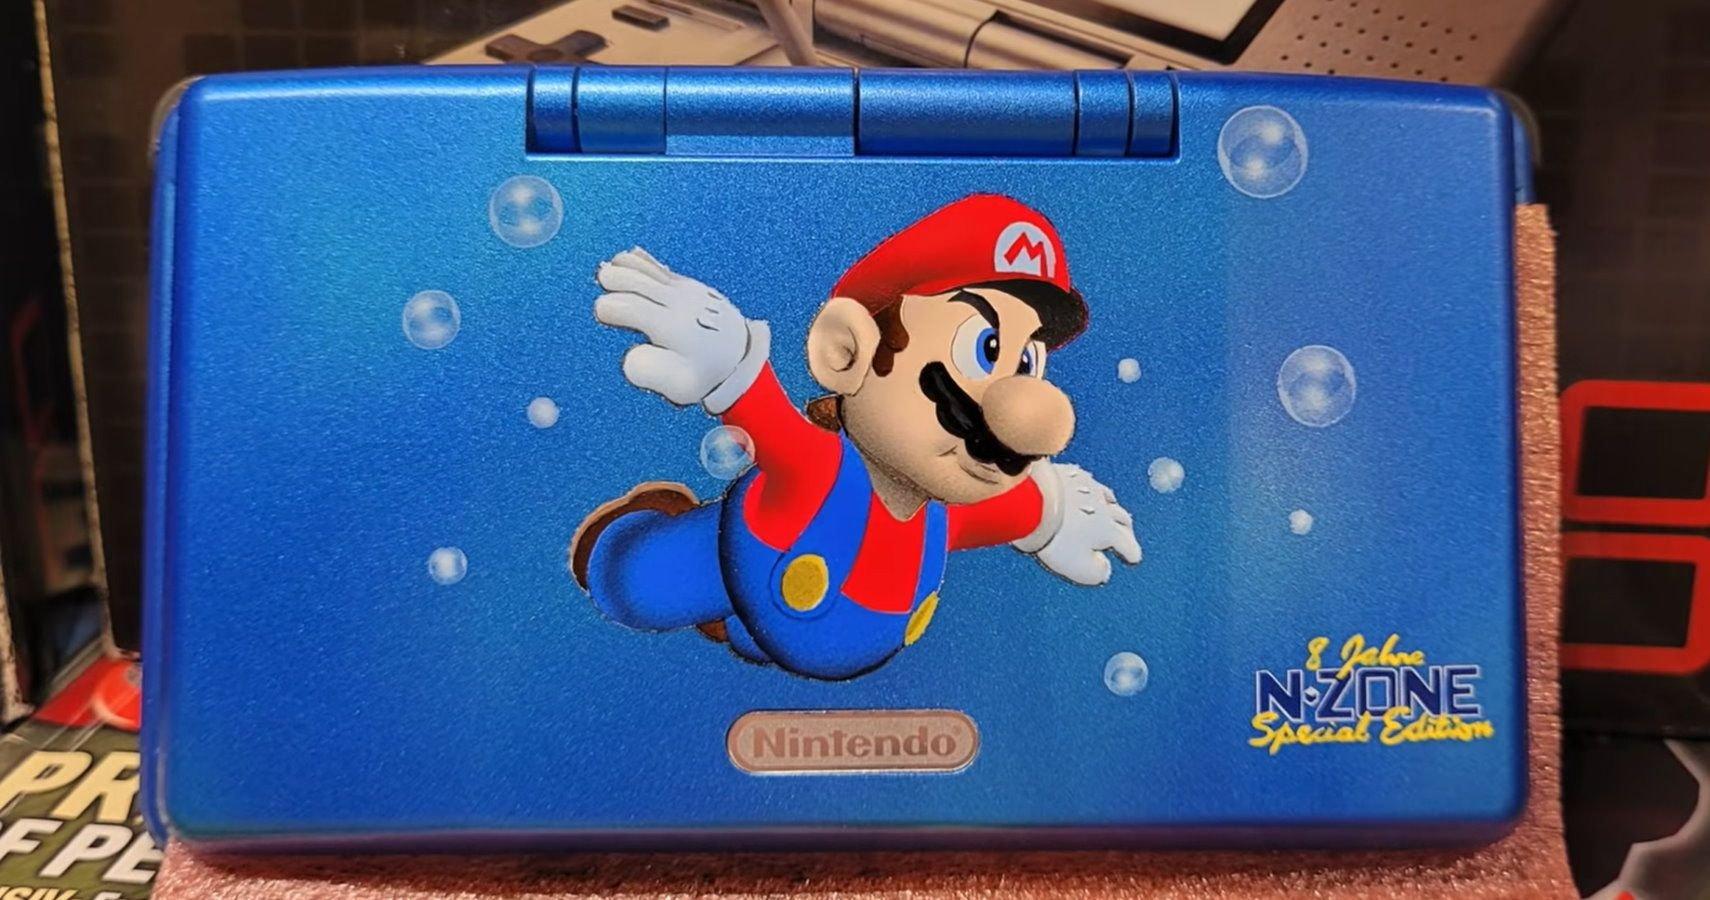 Video Shows Off Some Of Nintendo's Rarest Consoles